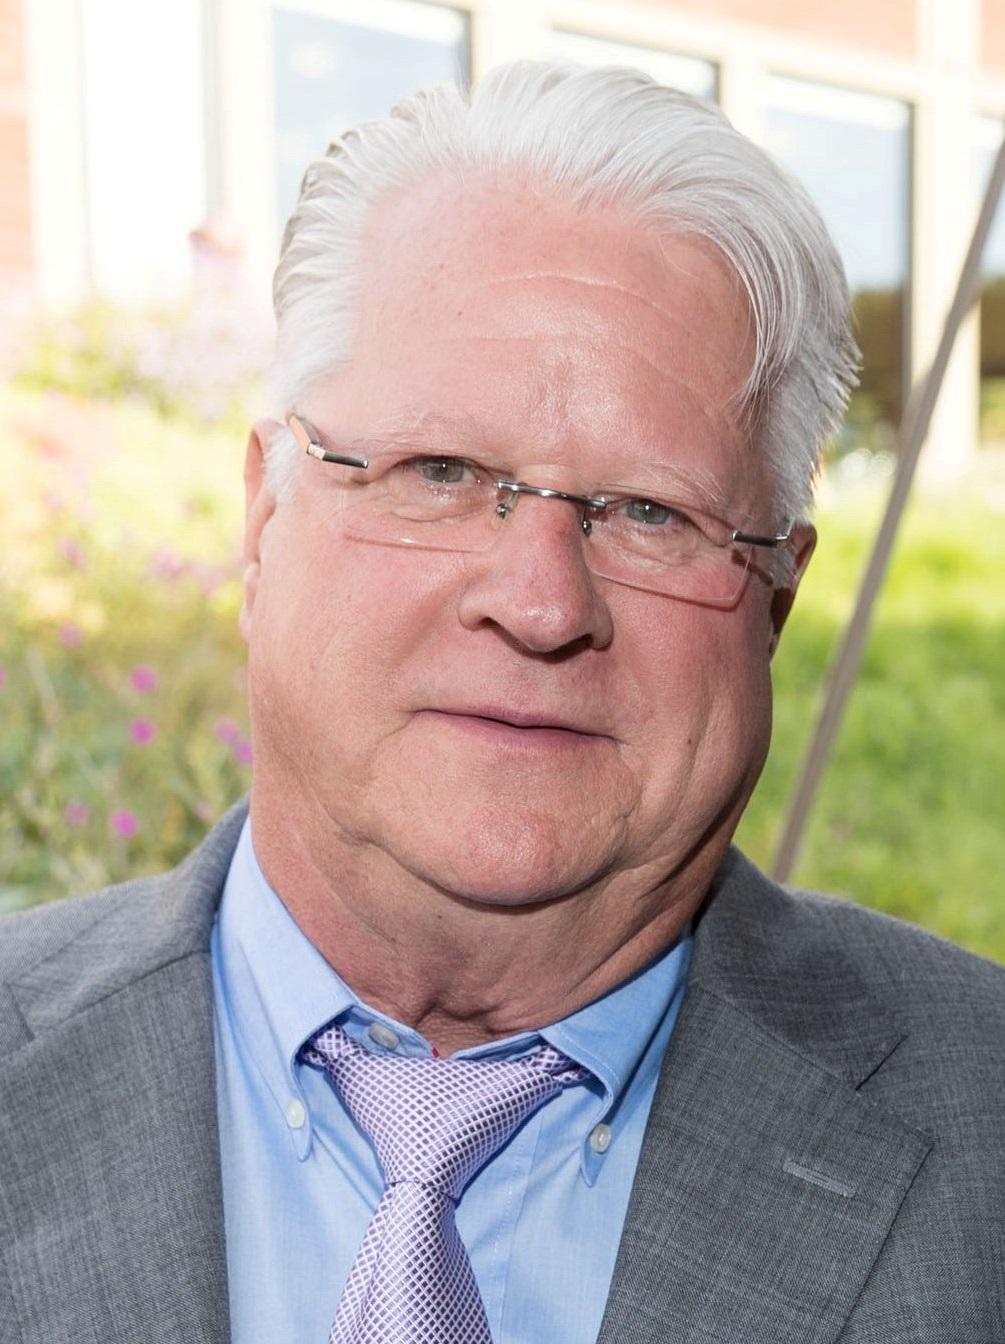 James Shorter